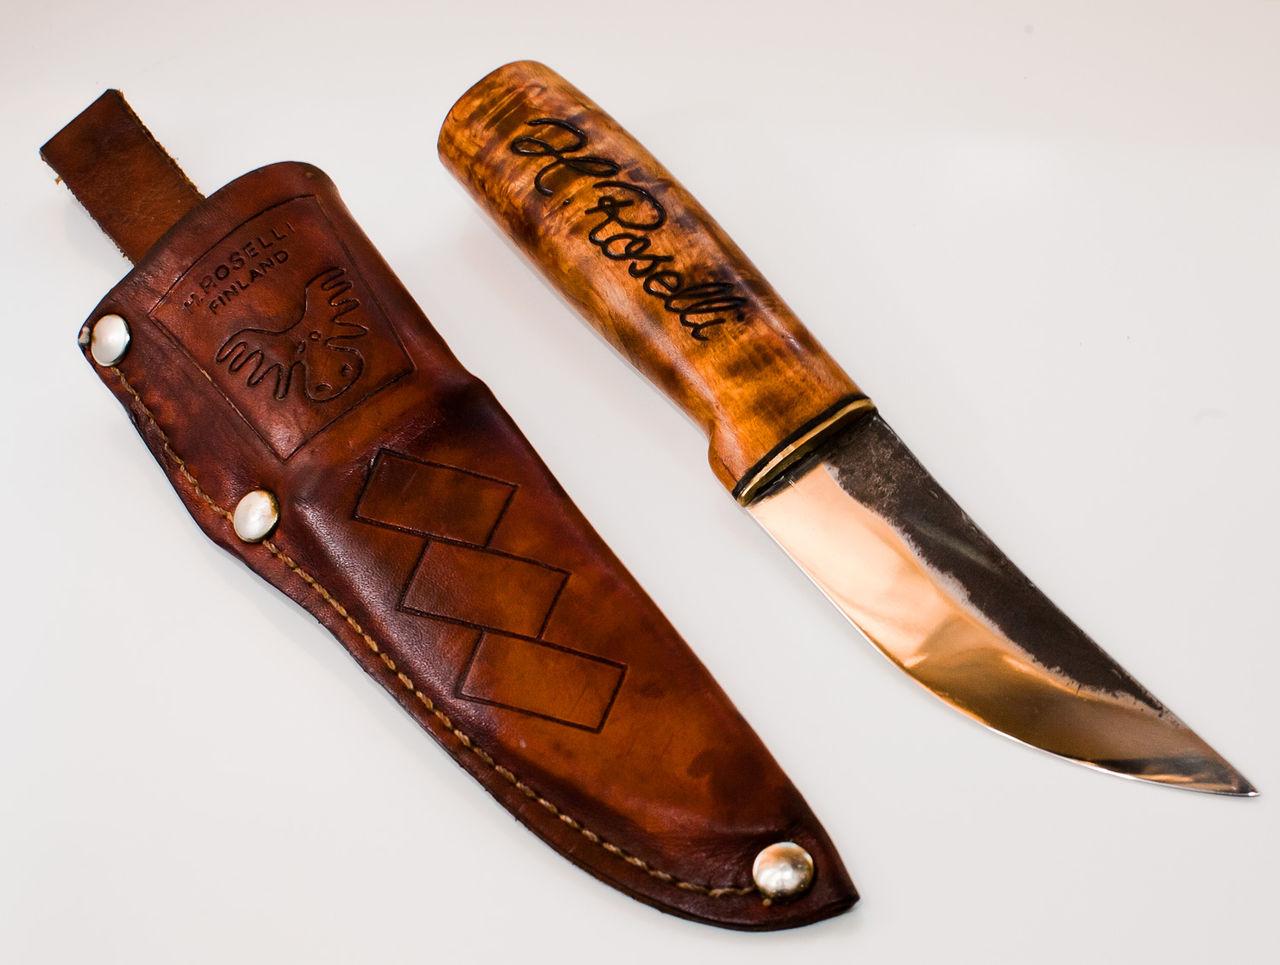 Финский охотничий нож Розелли Хантинг